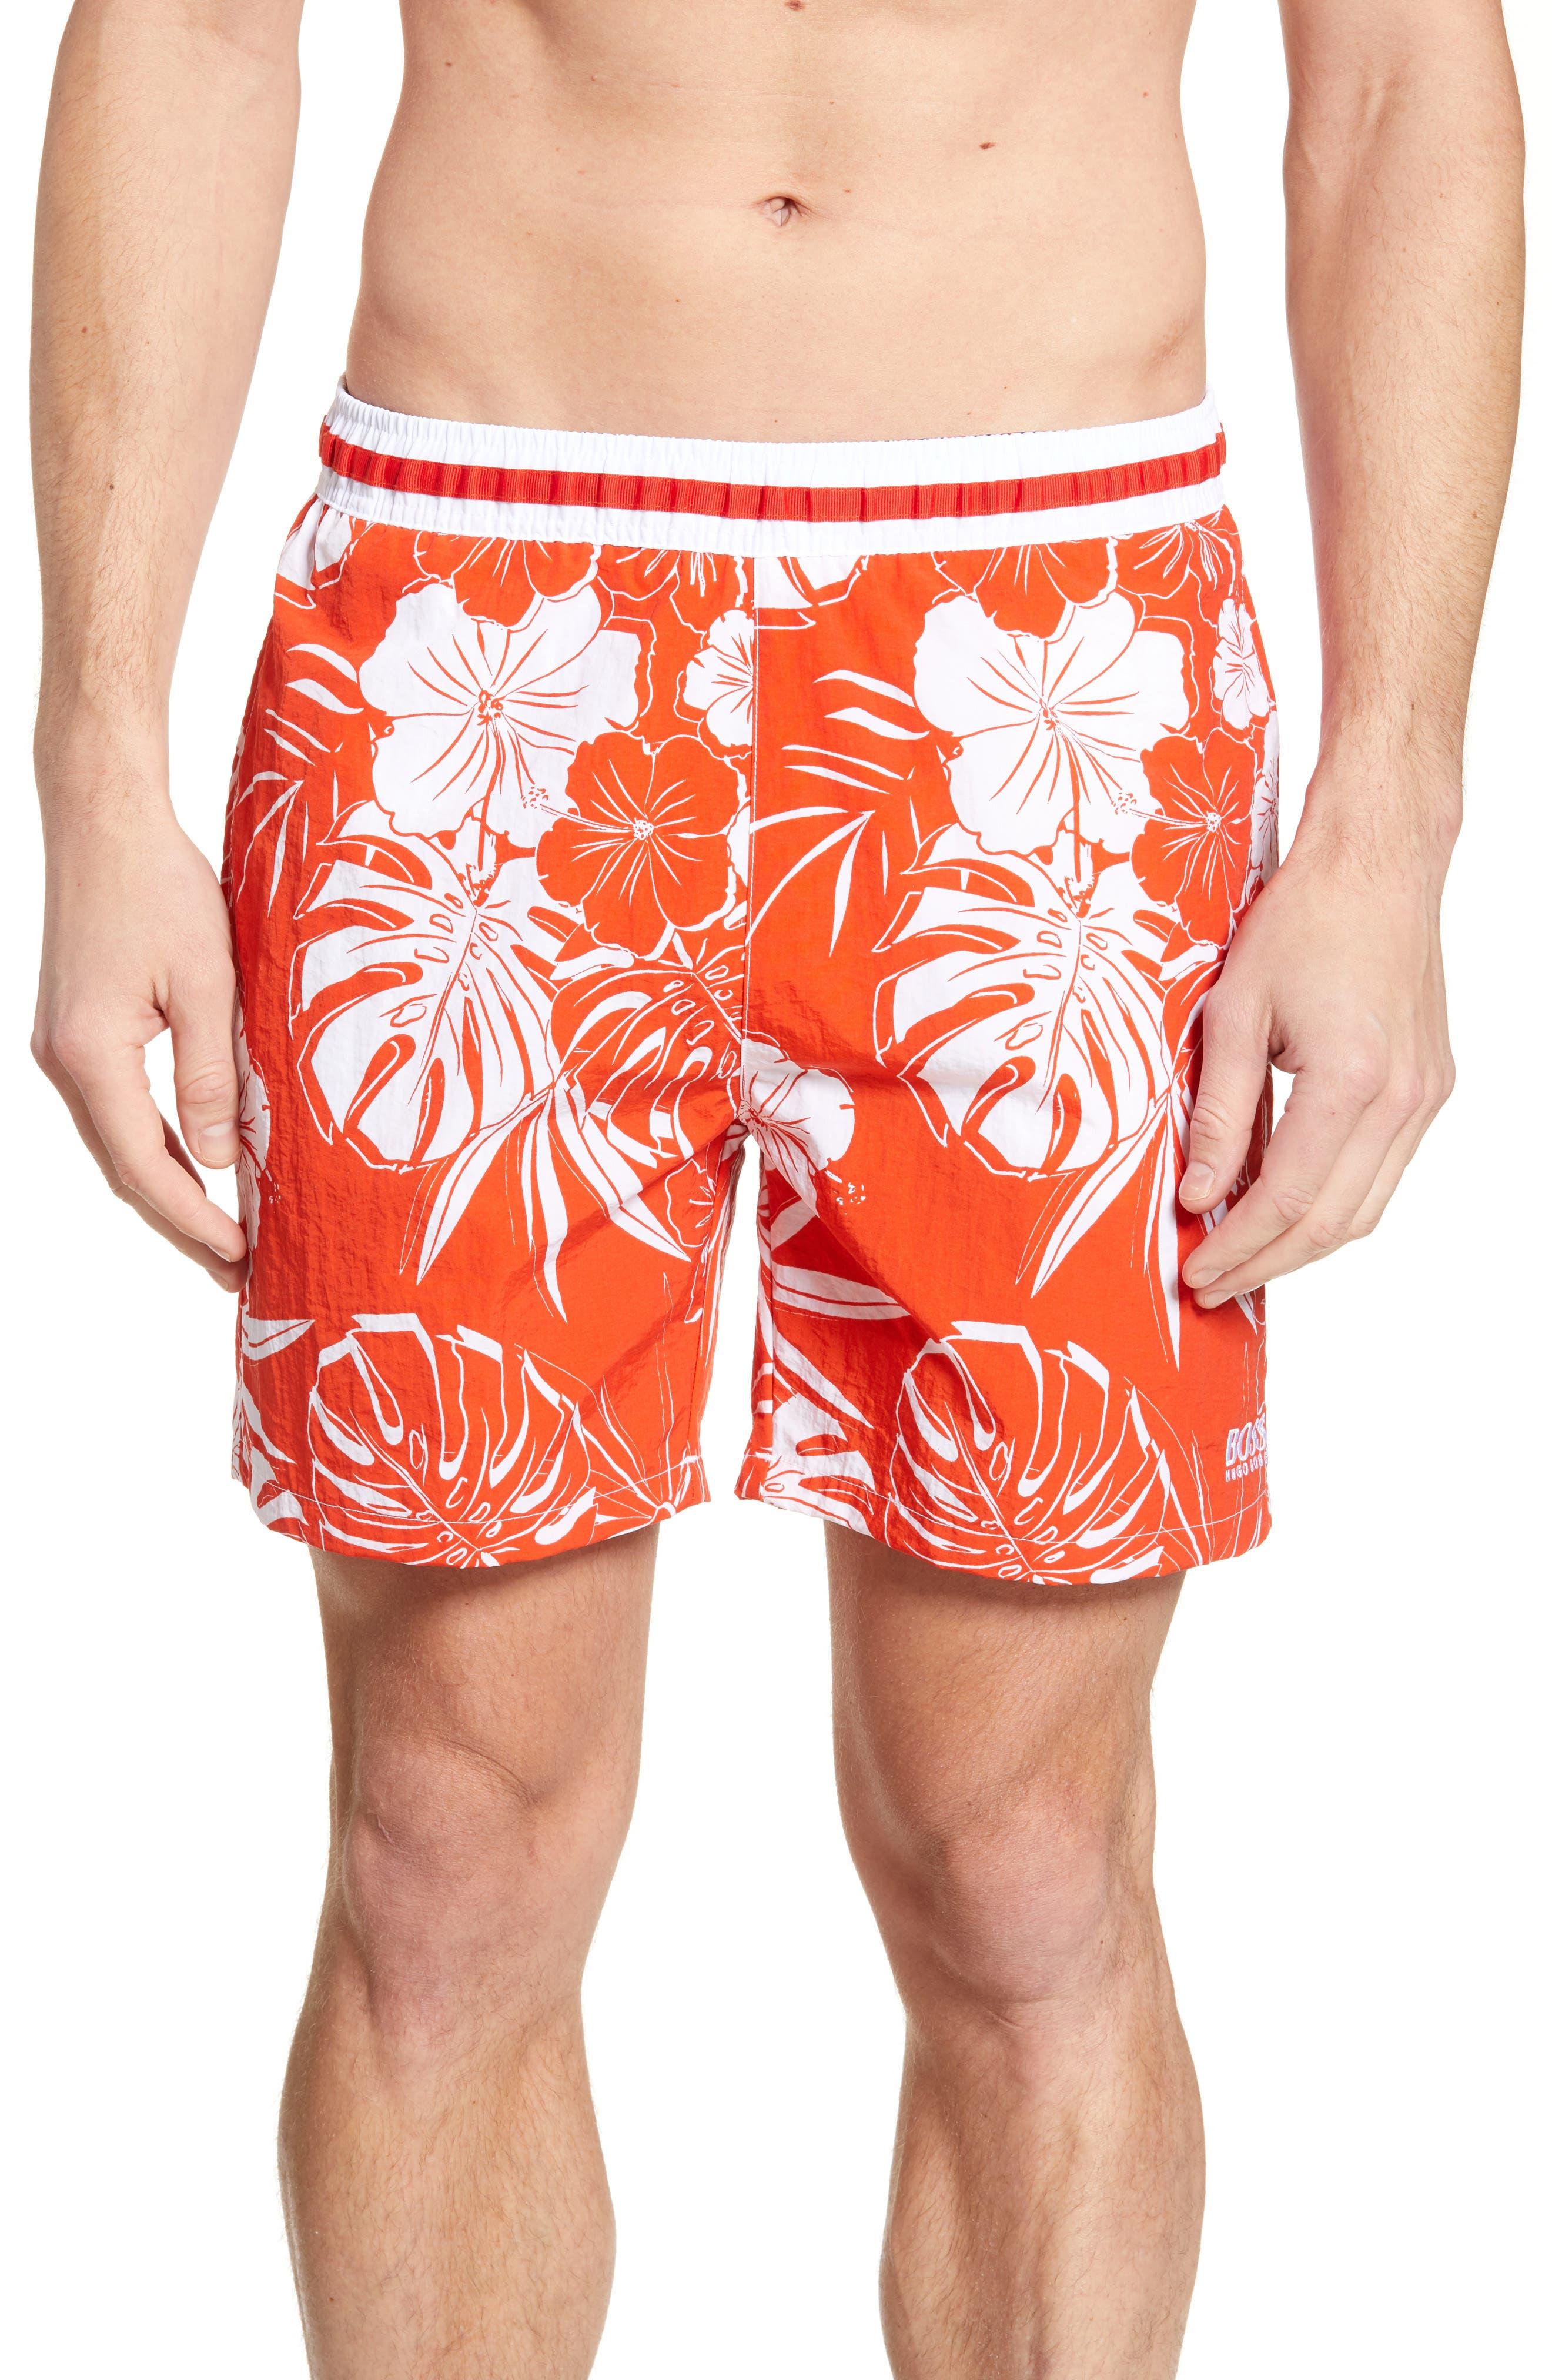 Vintage Men's Swimsuits – 1930s to 1970s History Mens Boss Goldfish Swim Trunks Size XX-Large - Red $52.80 AT vintagedancer.com